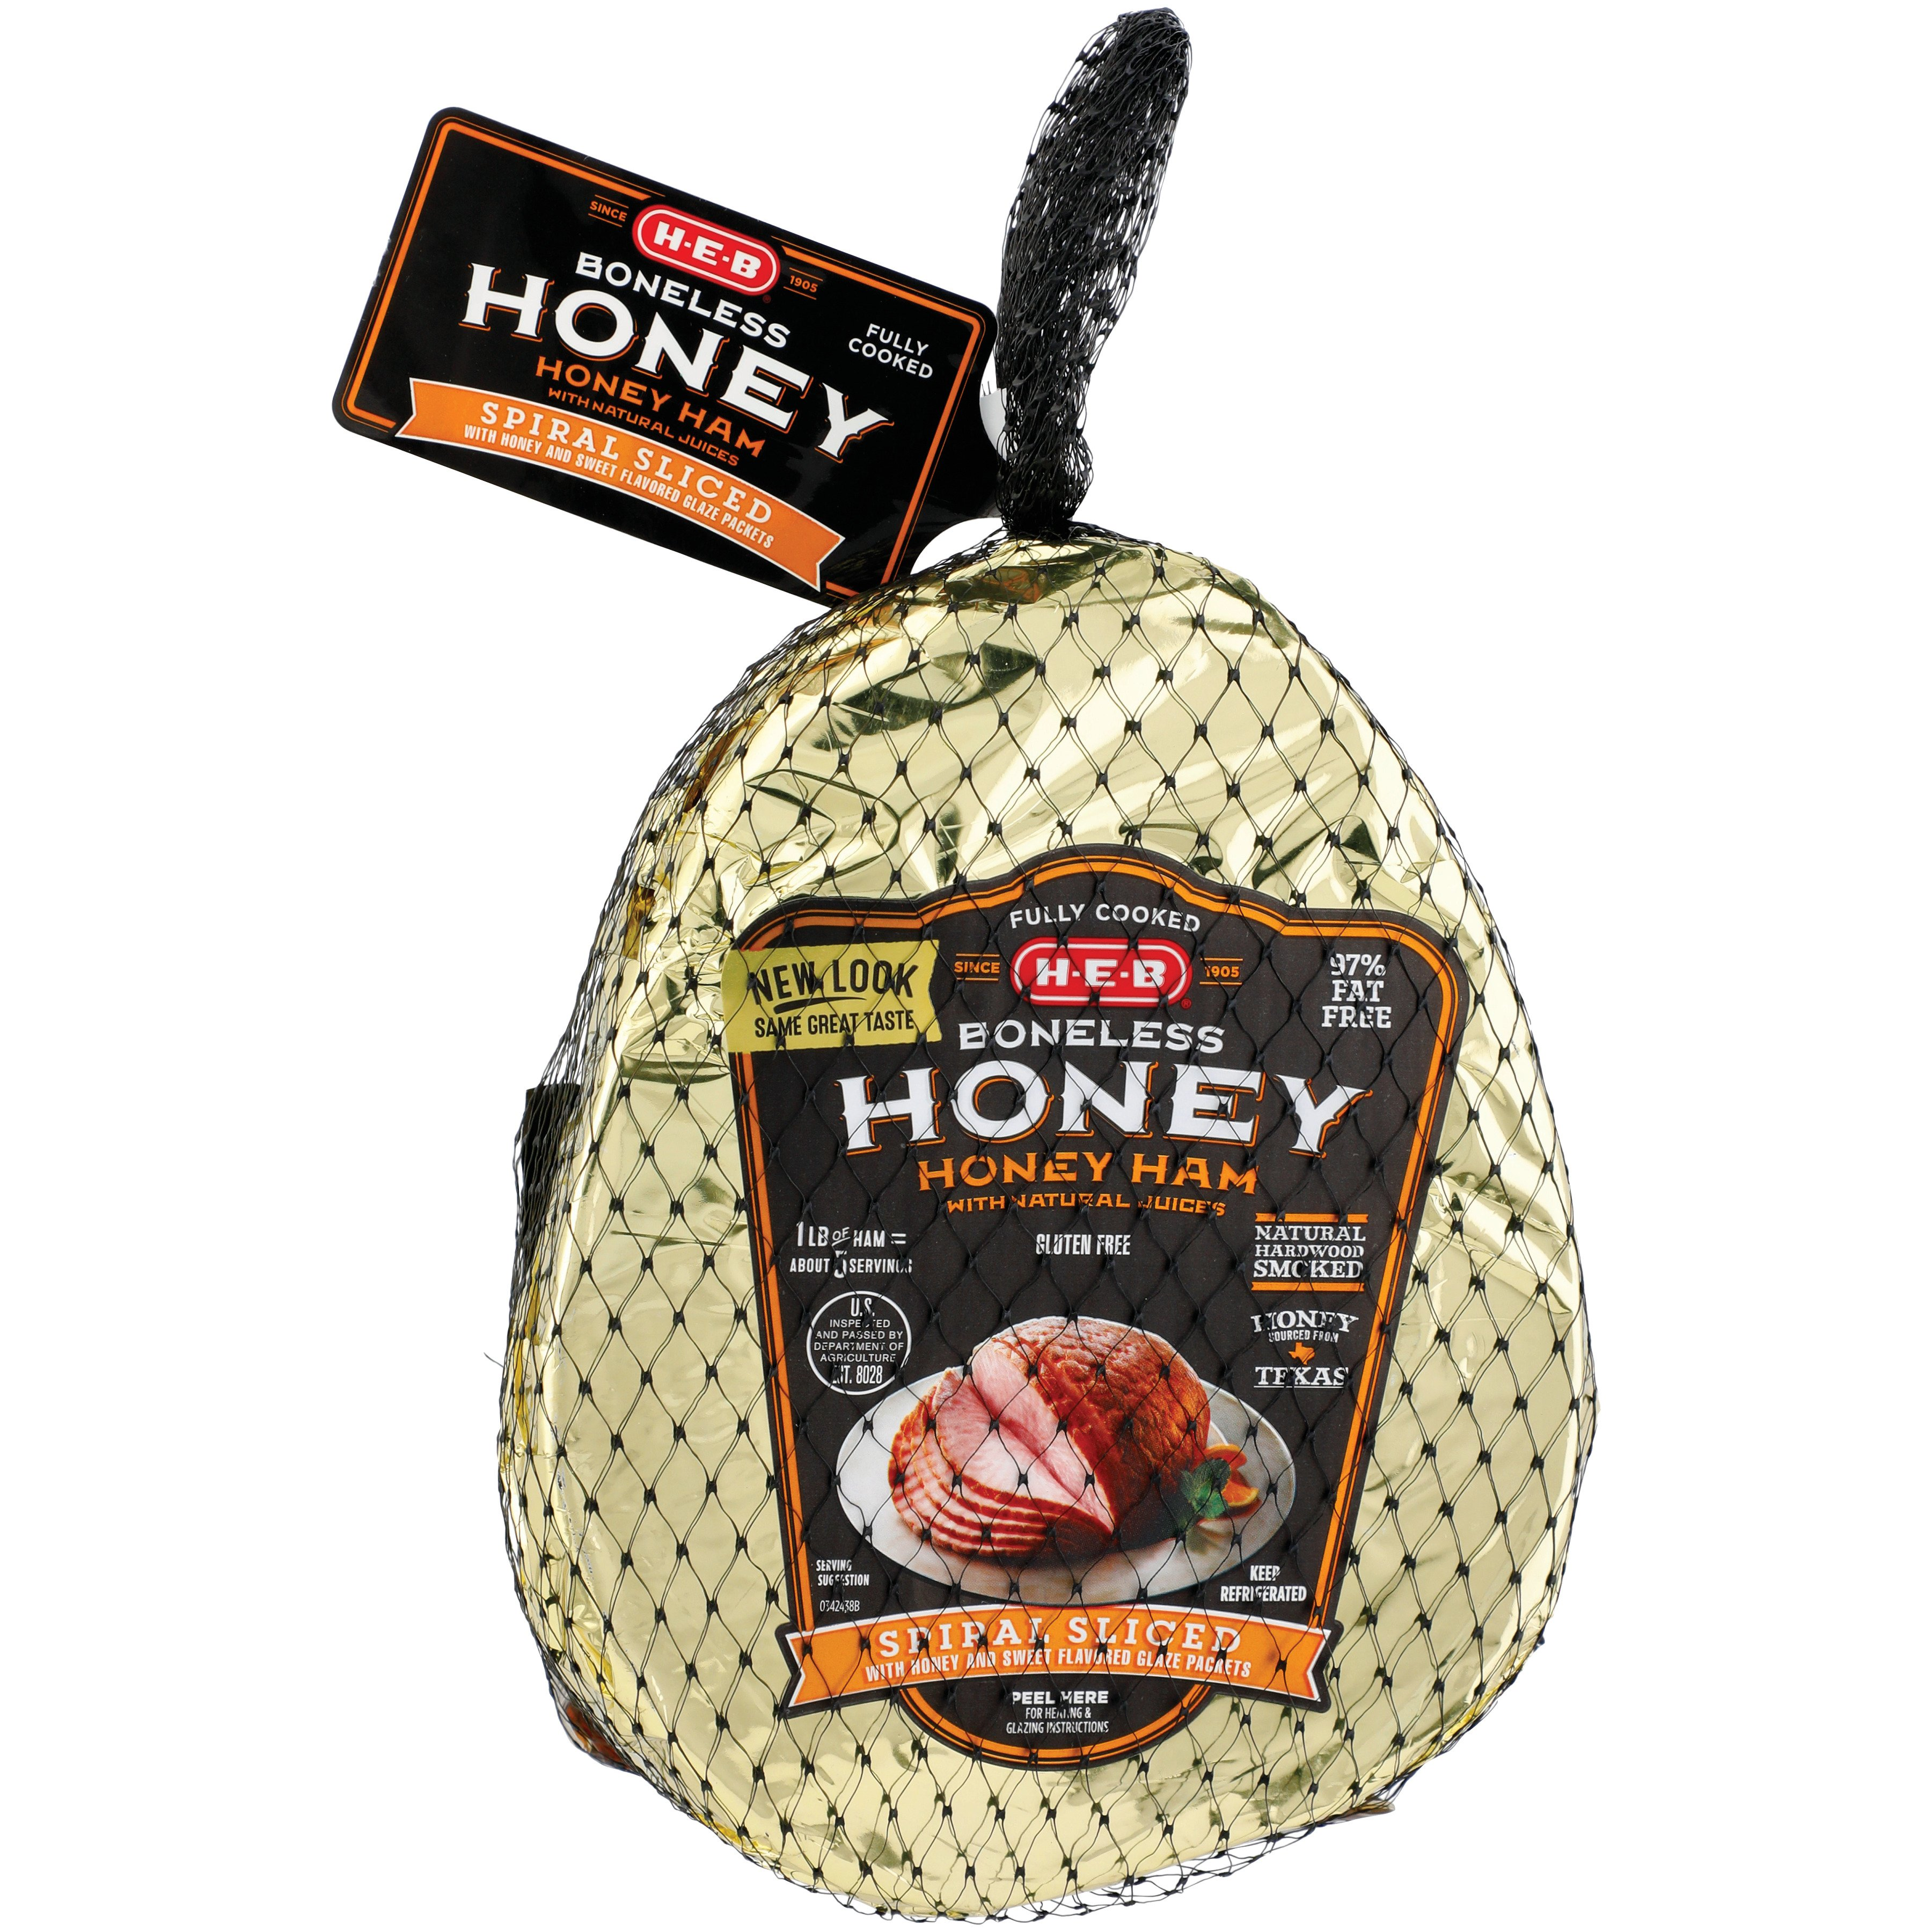 Heb Fully Cooked Boneless Spiral Sliced Honey Cured Ham Shop